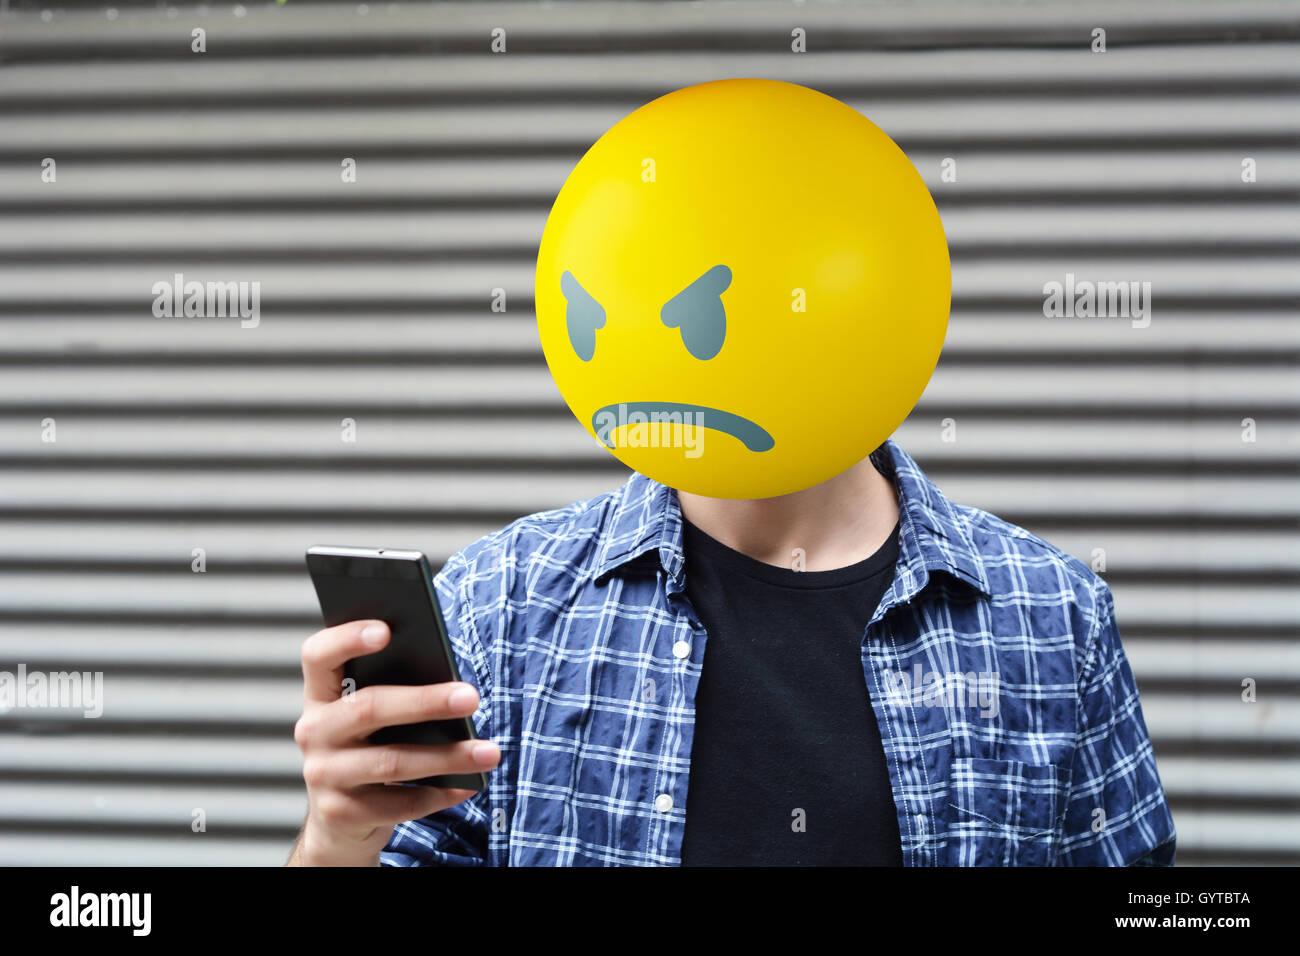 Angry emoji head man using a smartphone. - Stock Image